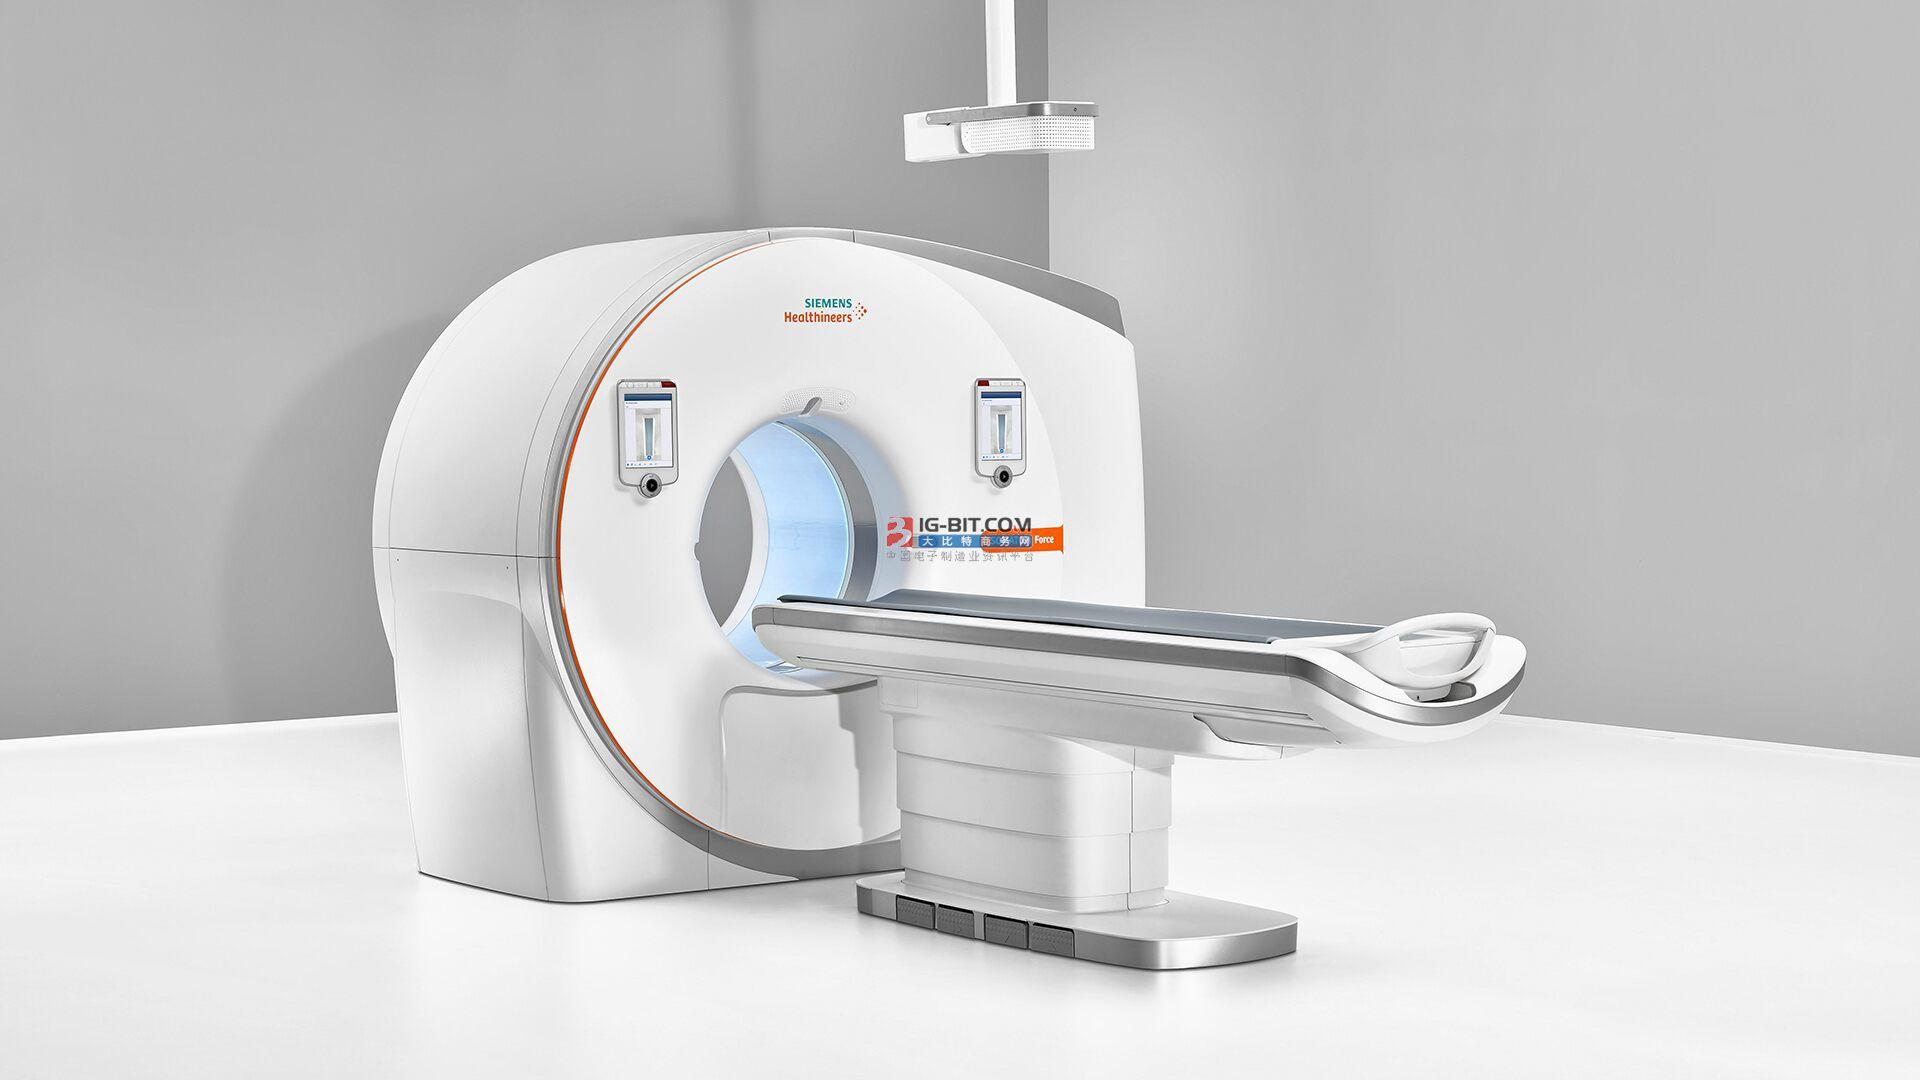 ams高水平CT探测器可提高新冠肺炎诊断效率